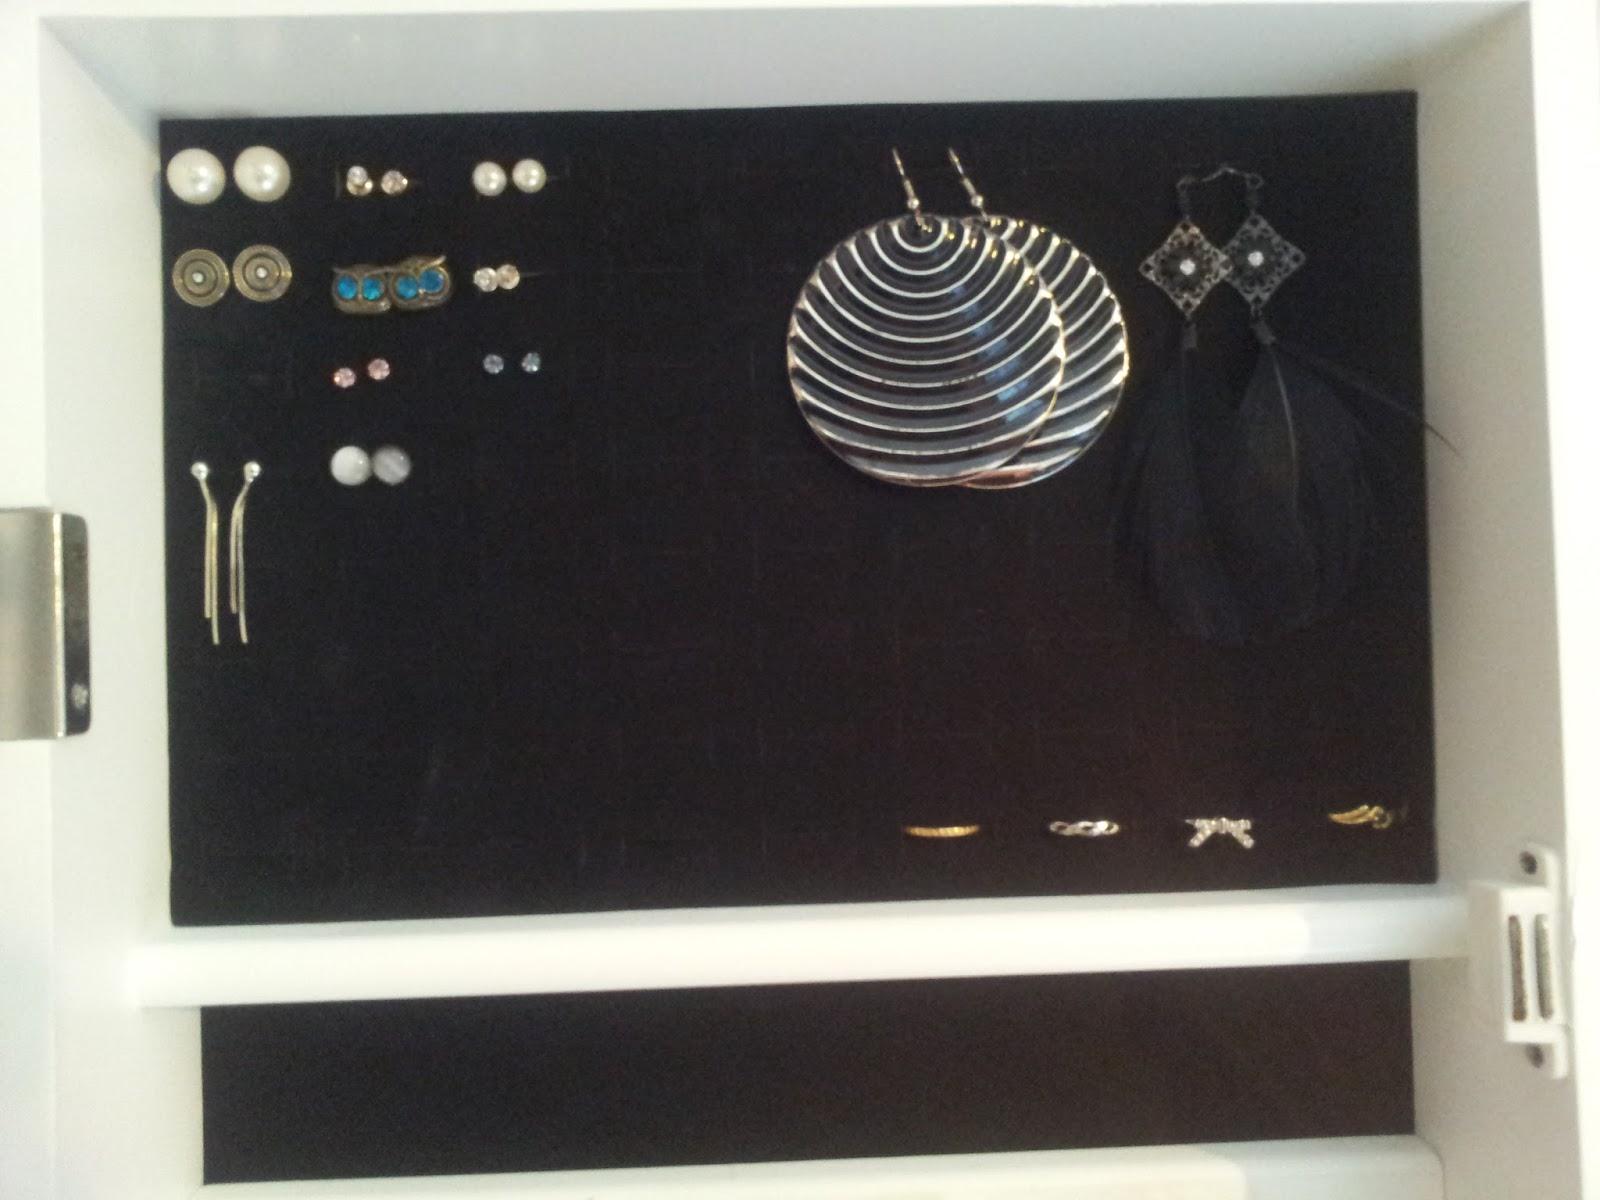 Zoom sur mon miroir a bijoux casa lanantaize blog for Miroir rangement bijoux casa